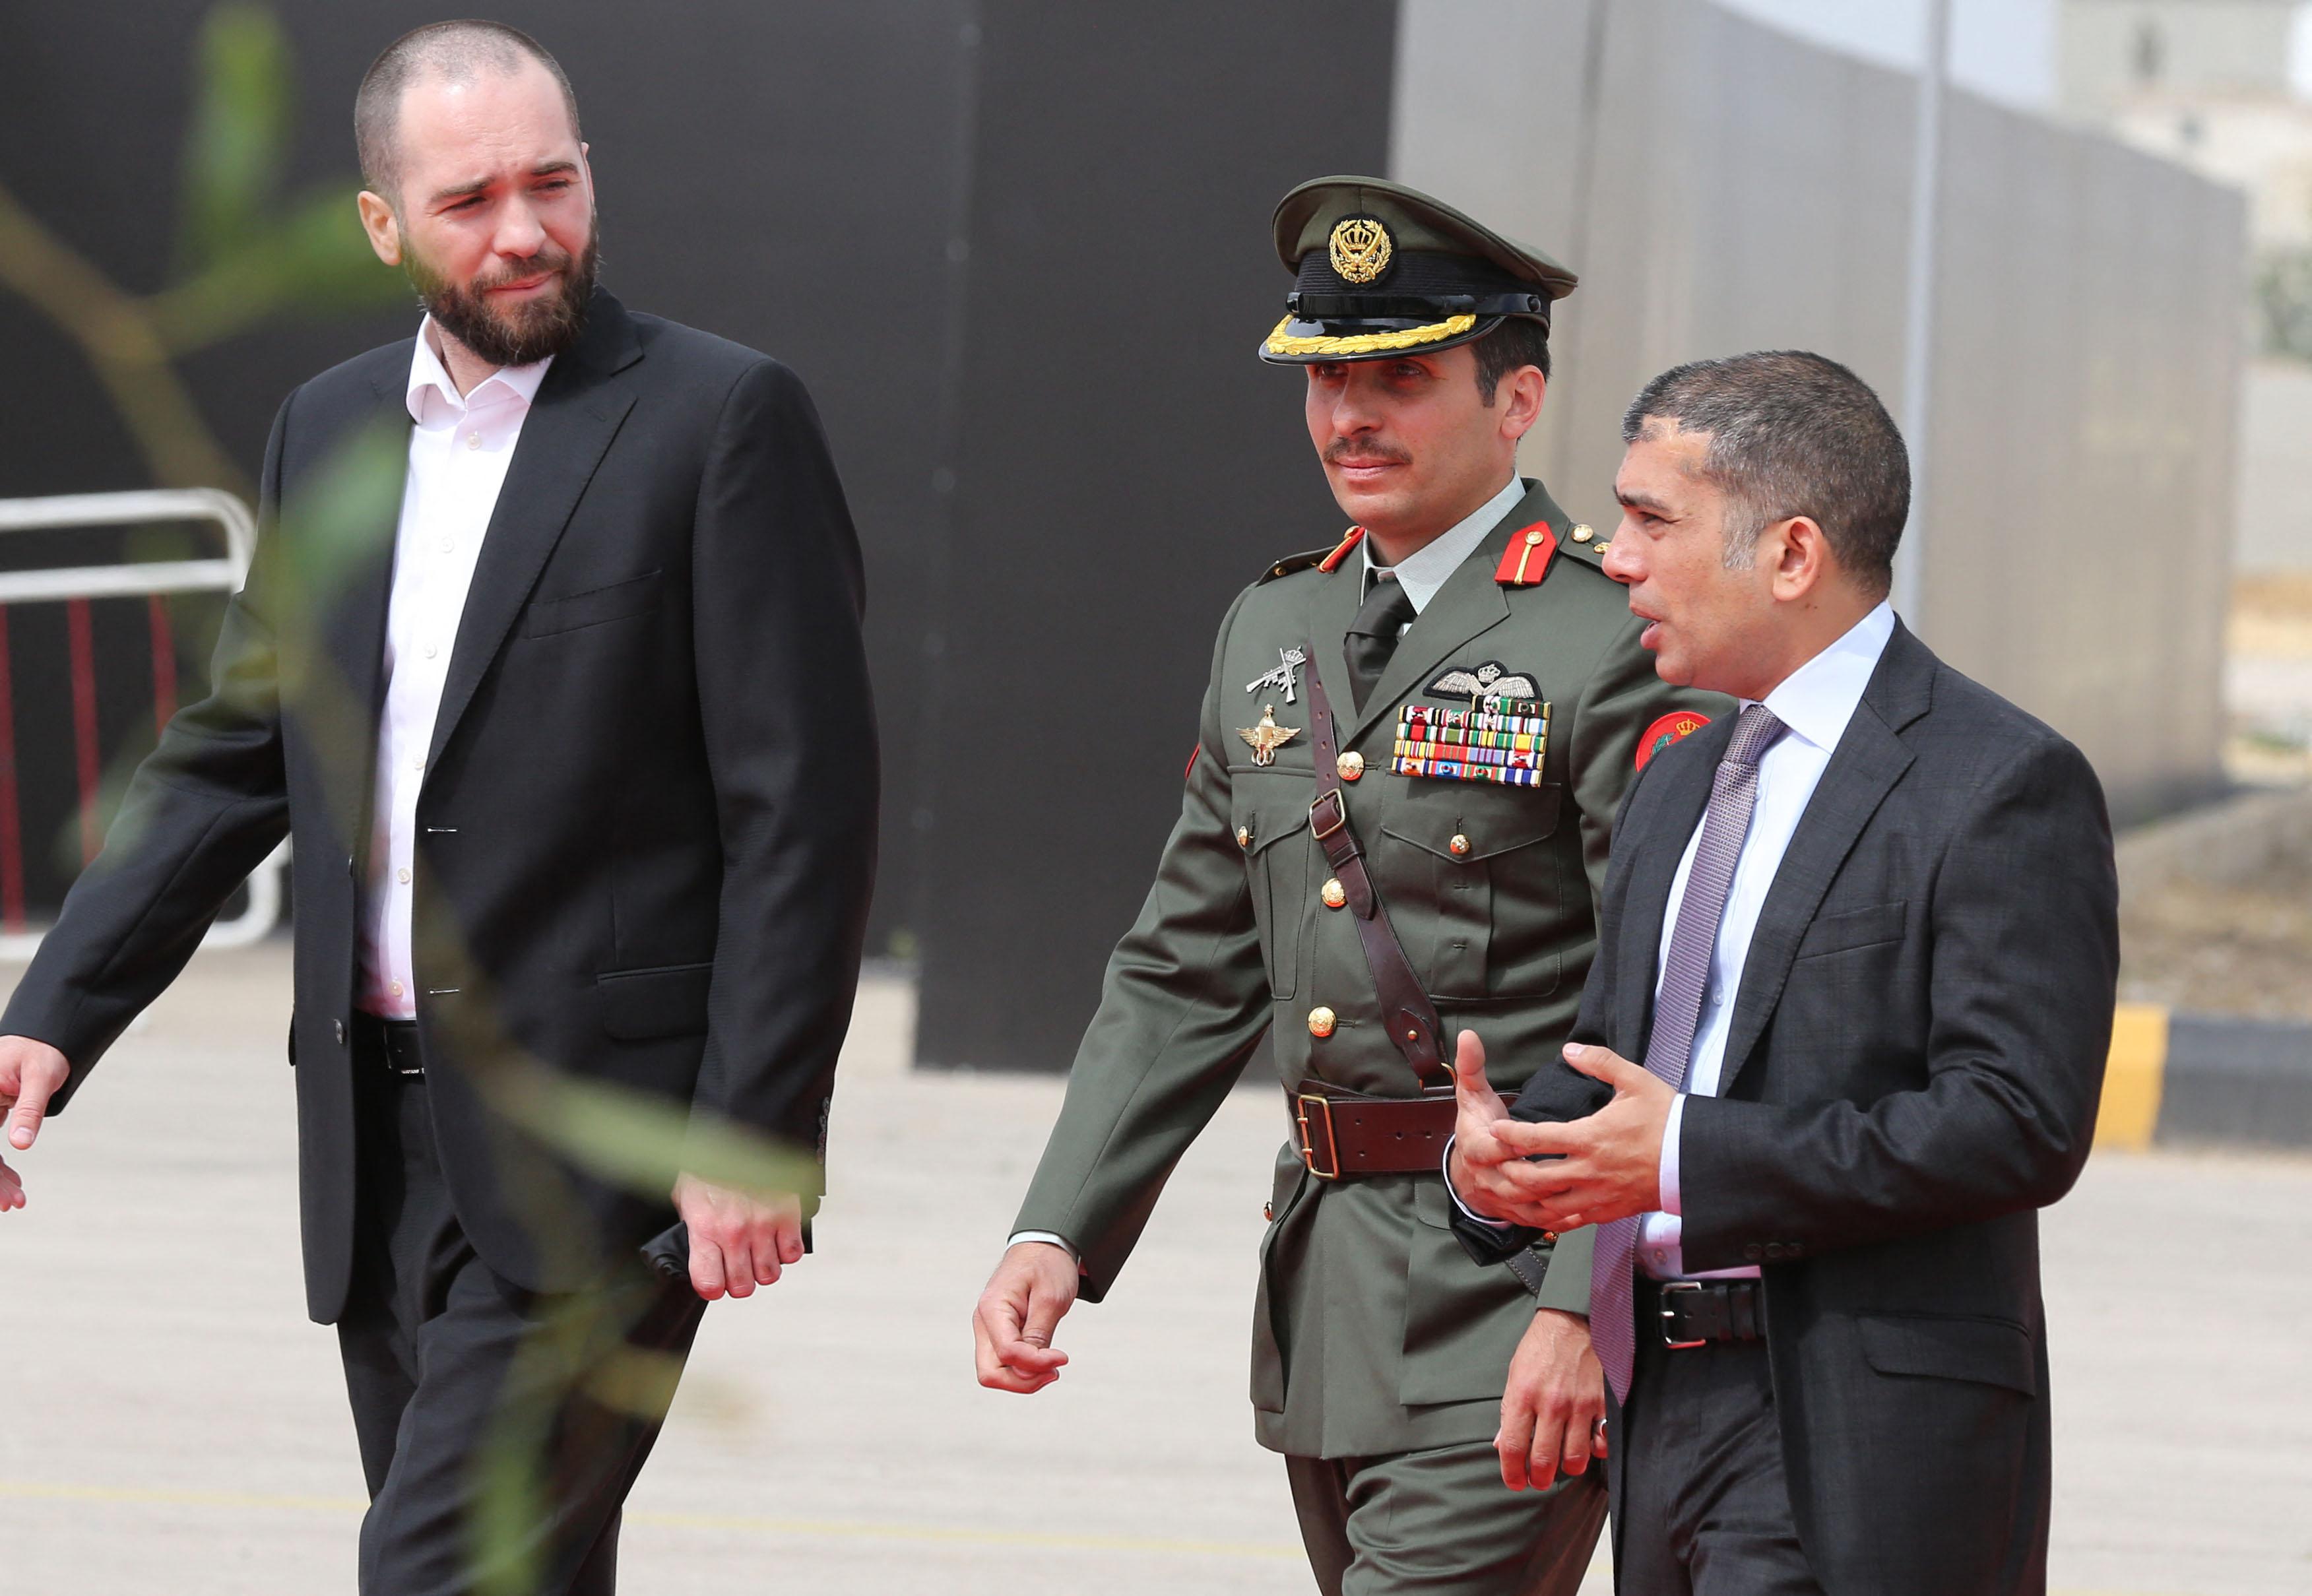 Jordanian princes Hashem bin al-Hussein (L) Hamza bin al-Hussein (C) and  Rashed bin al-Hassan (R) arrive at the opening of the…